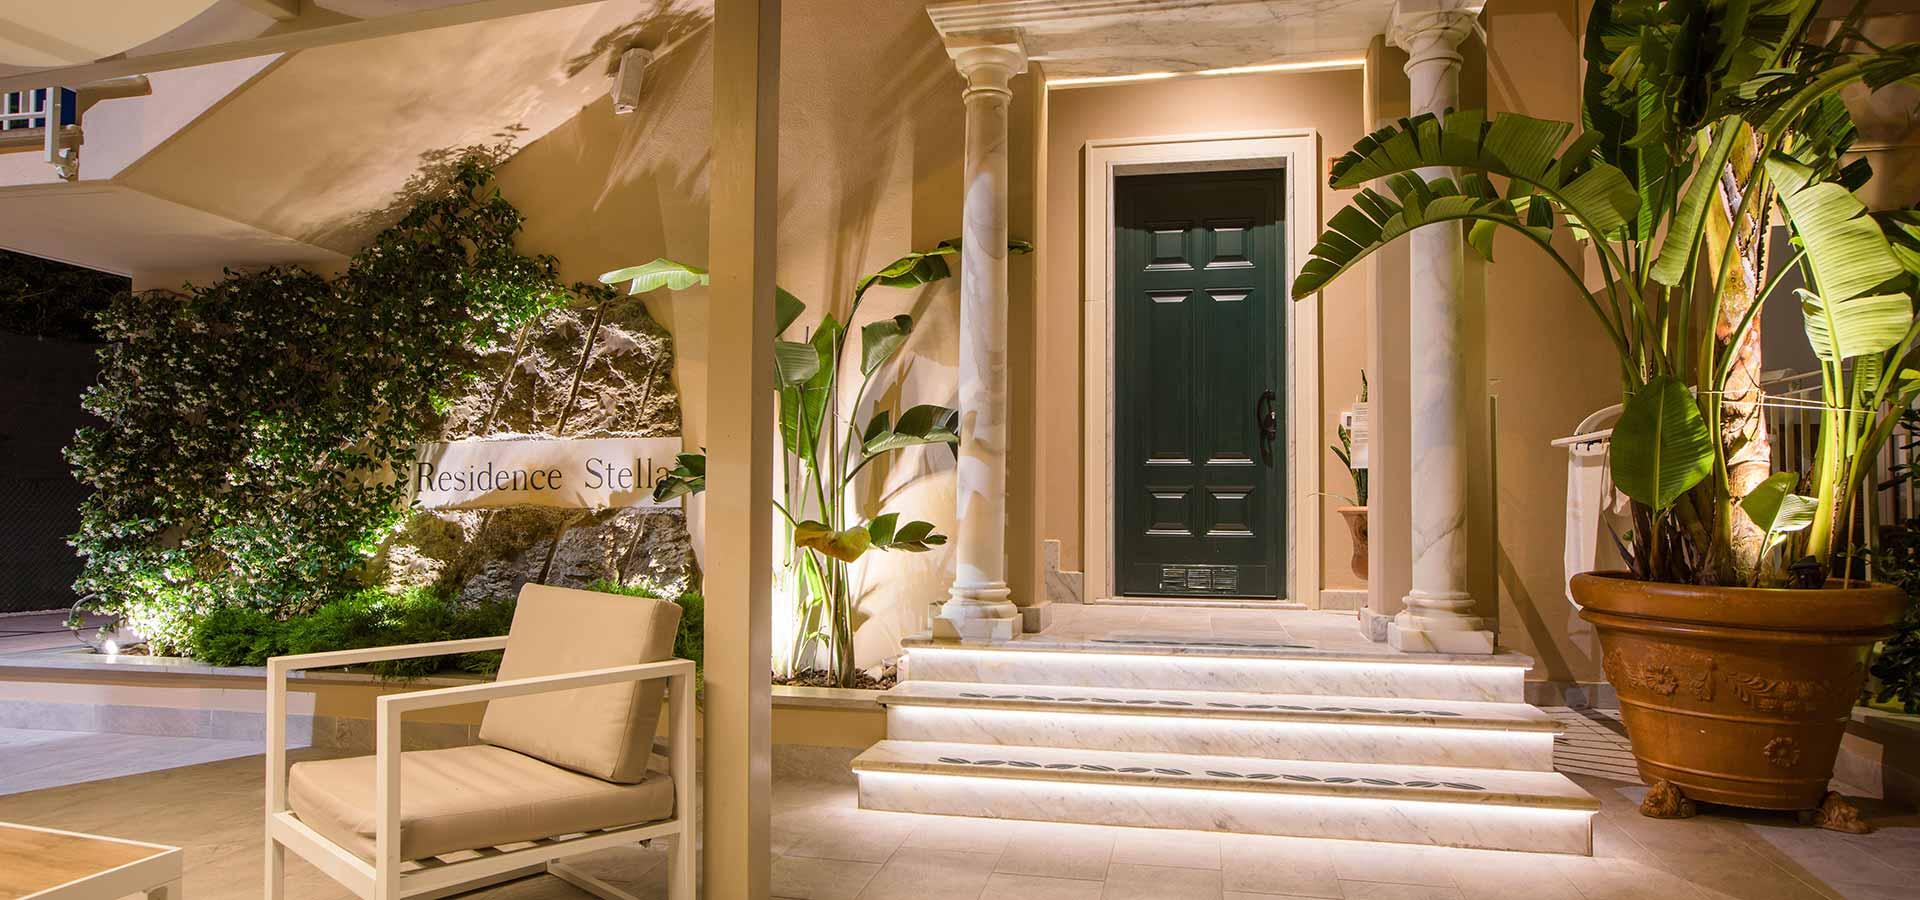 Residence Stella a Marina di Massa, R.T.A. a 30 metri dal mare